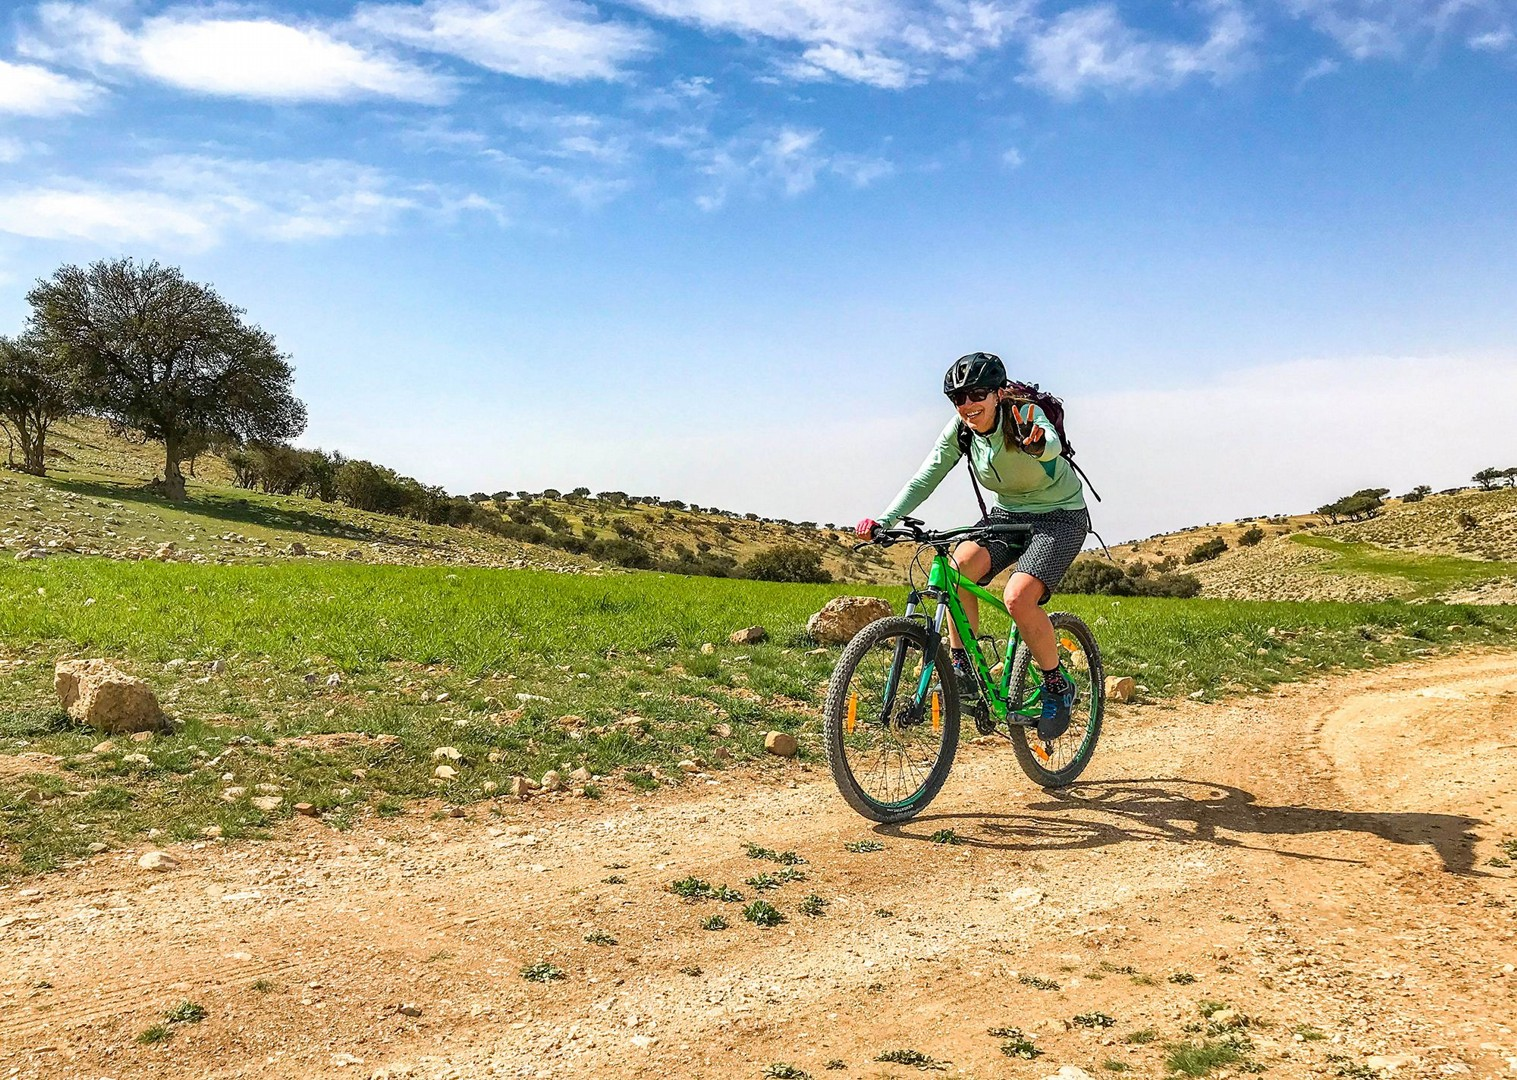 cycling-saddle-skedaddle-jordan-adventures-guided.jpg - NEW! Jordan - Petra, Wadi Rum & the Dead Sea - Cycling Adventures